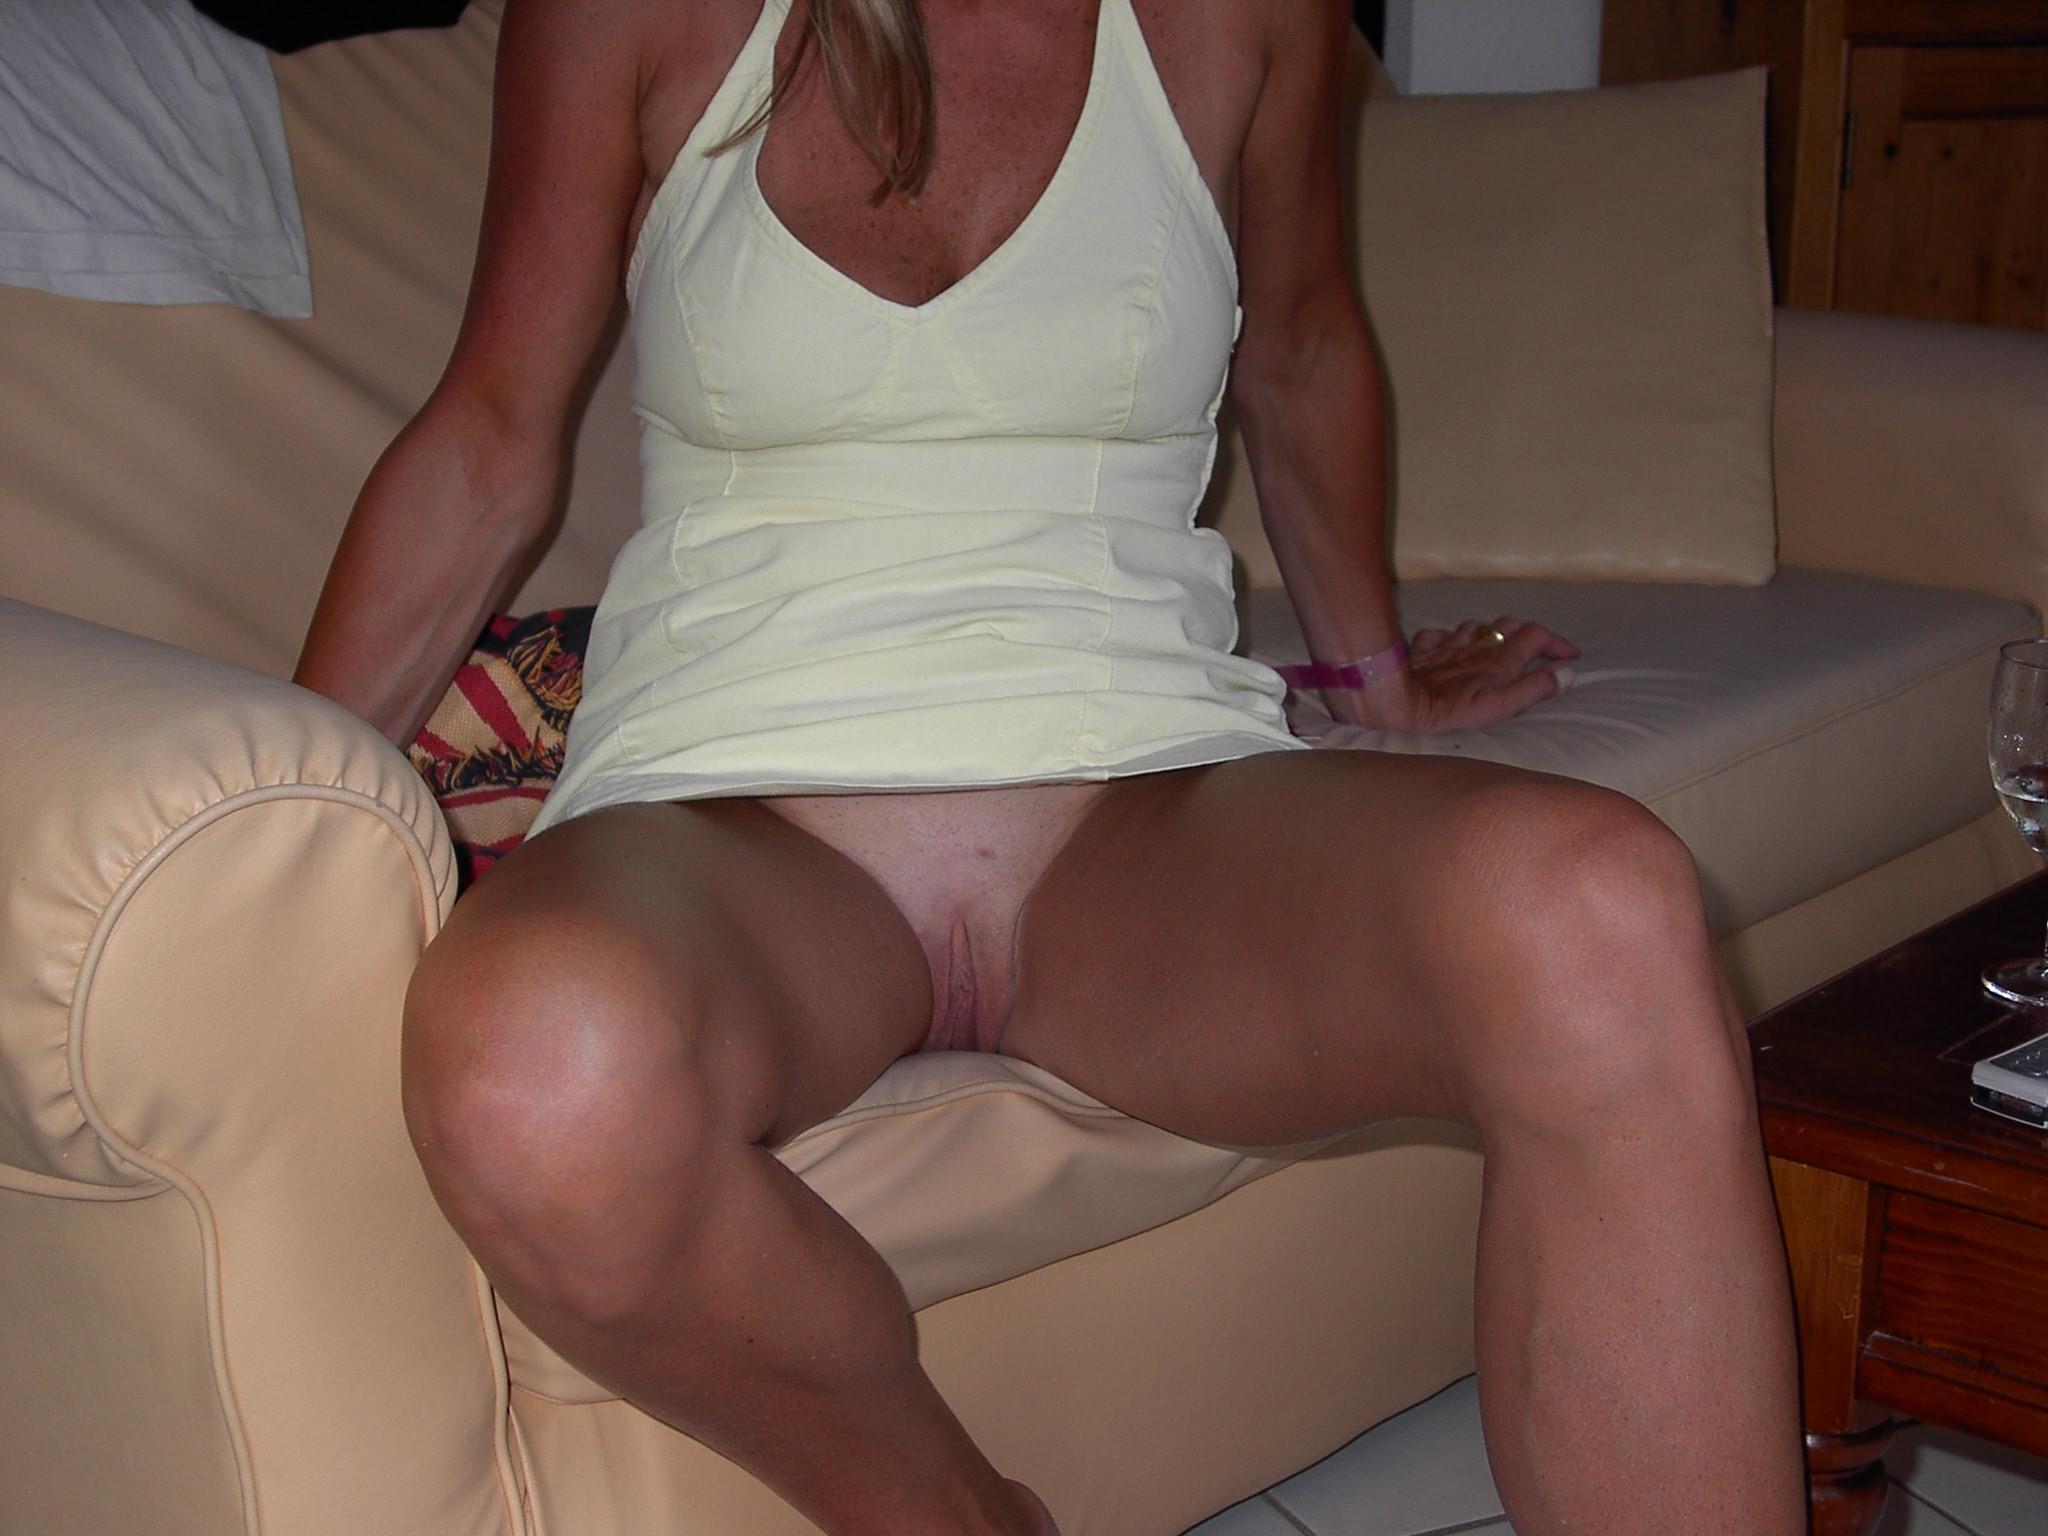 Milf short skirt upskirt